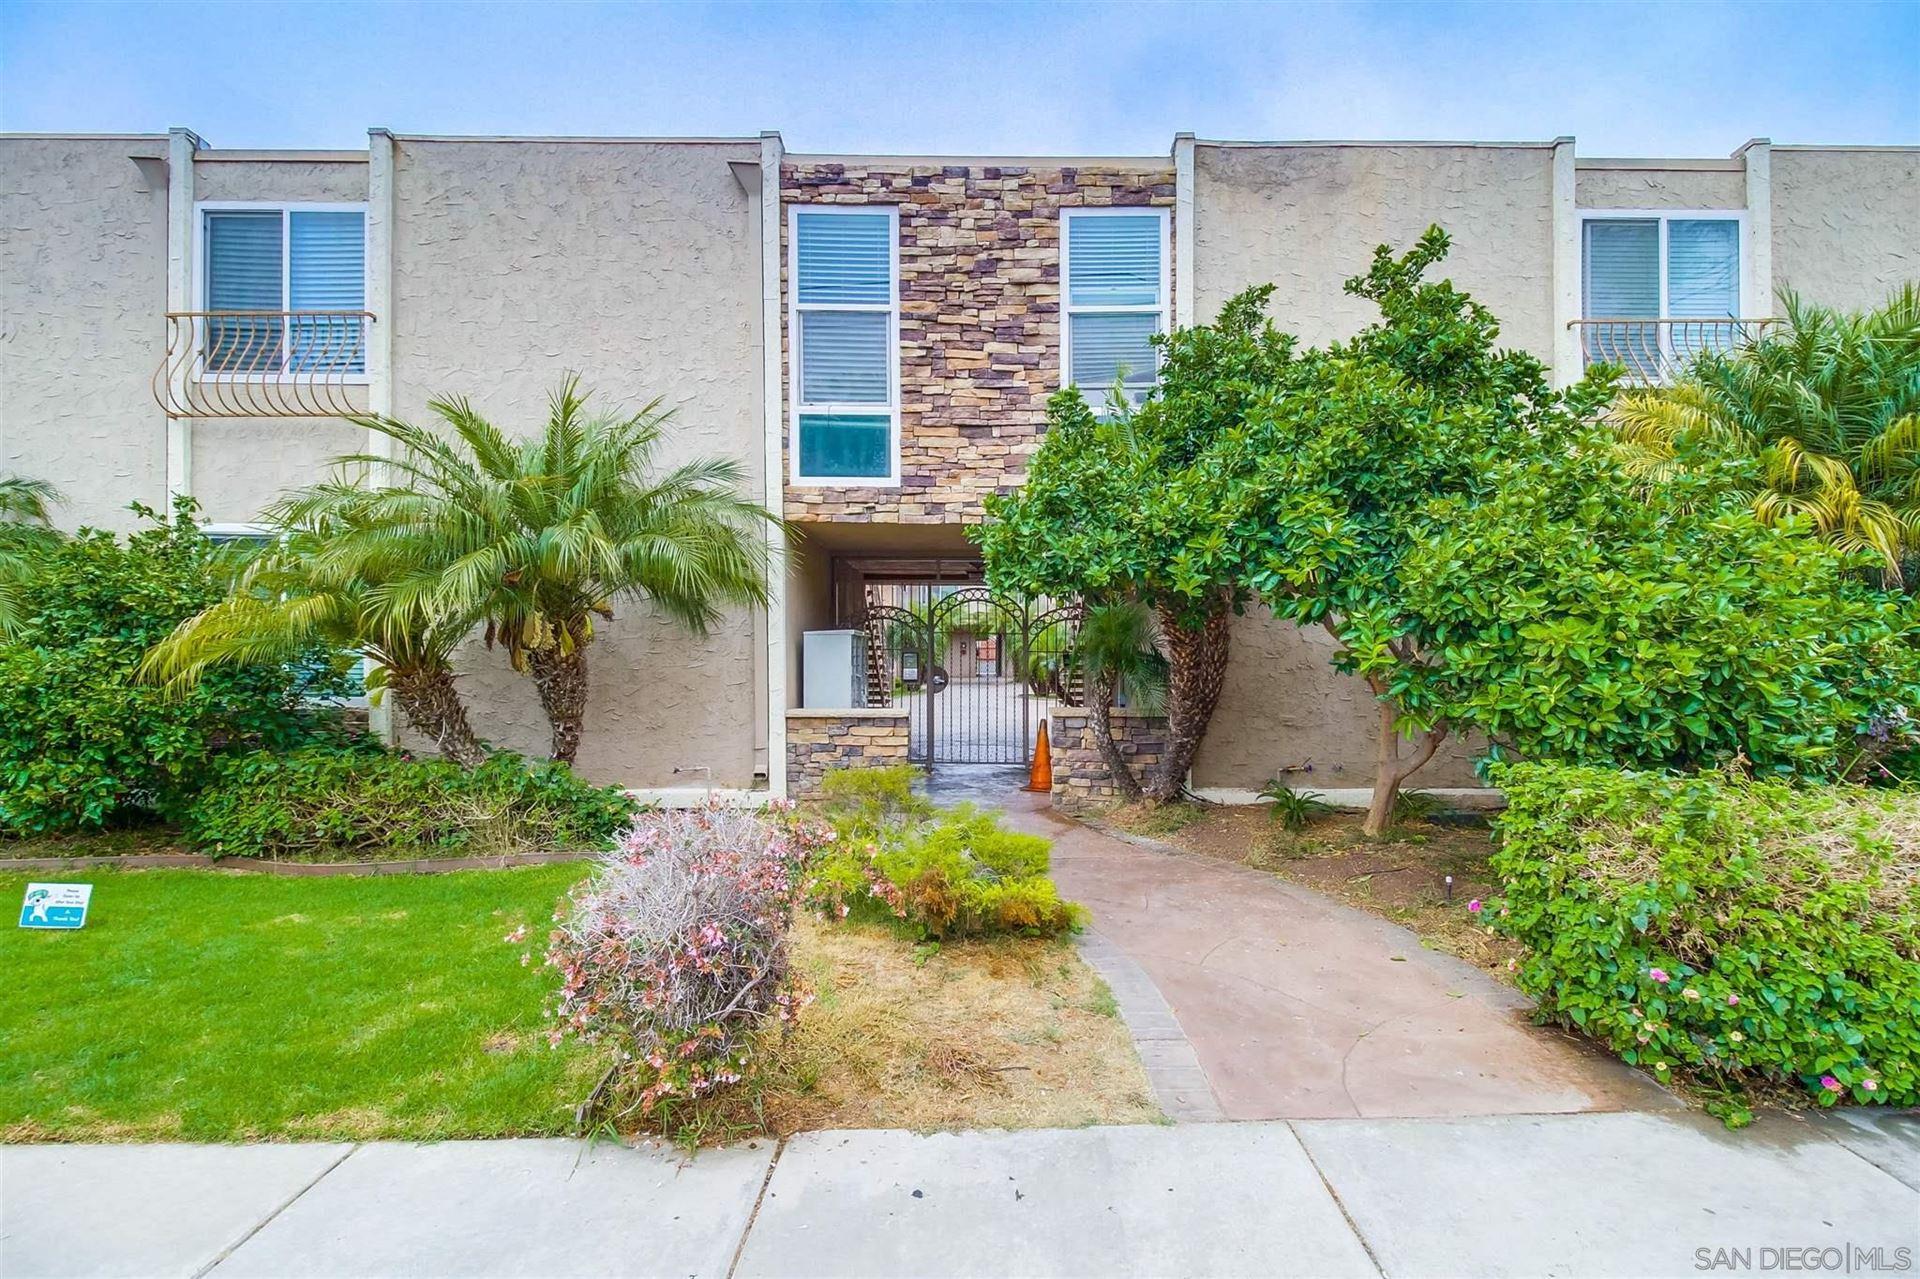 Photo of 1472 Iris Ave #5, Imperial Beach, CA 91932 (MLS # 210021148)